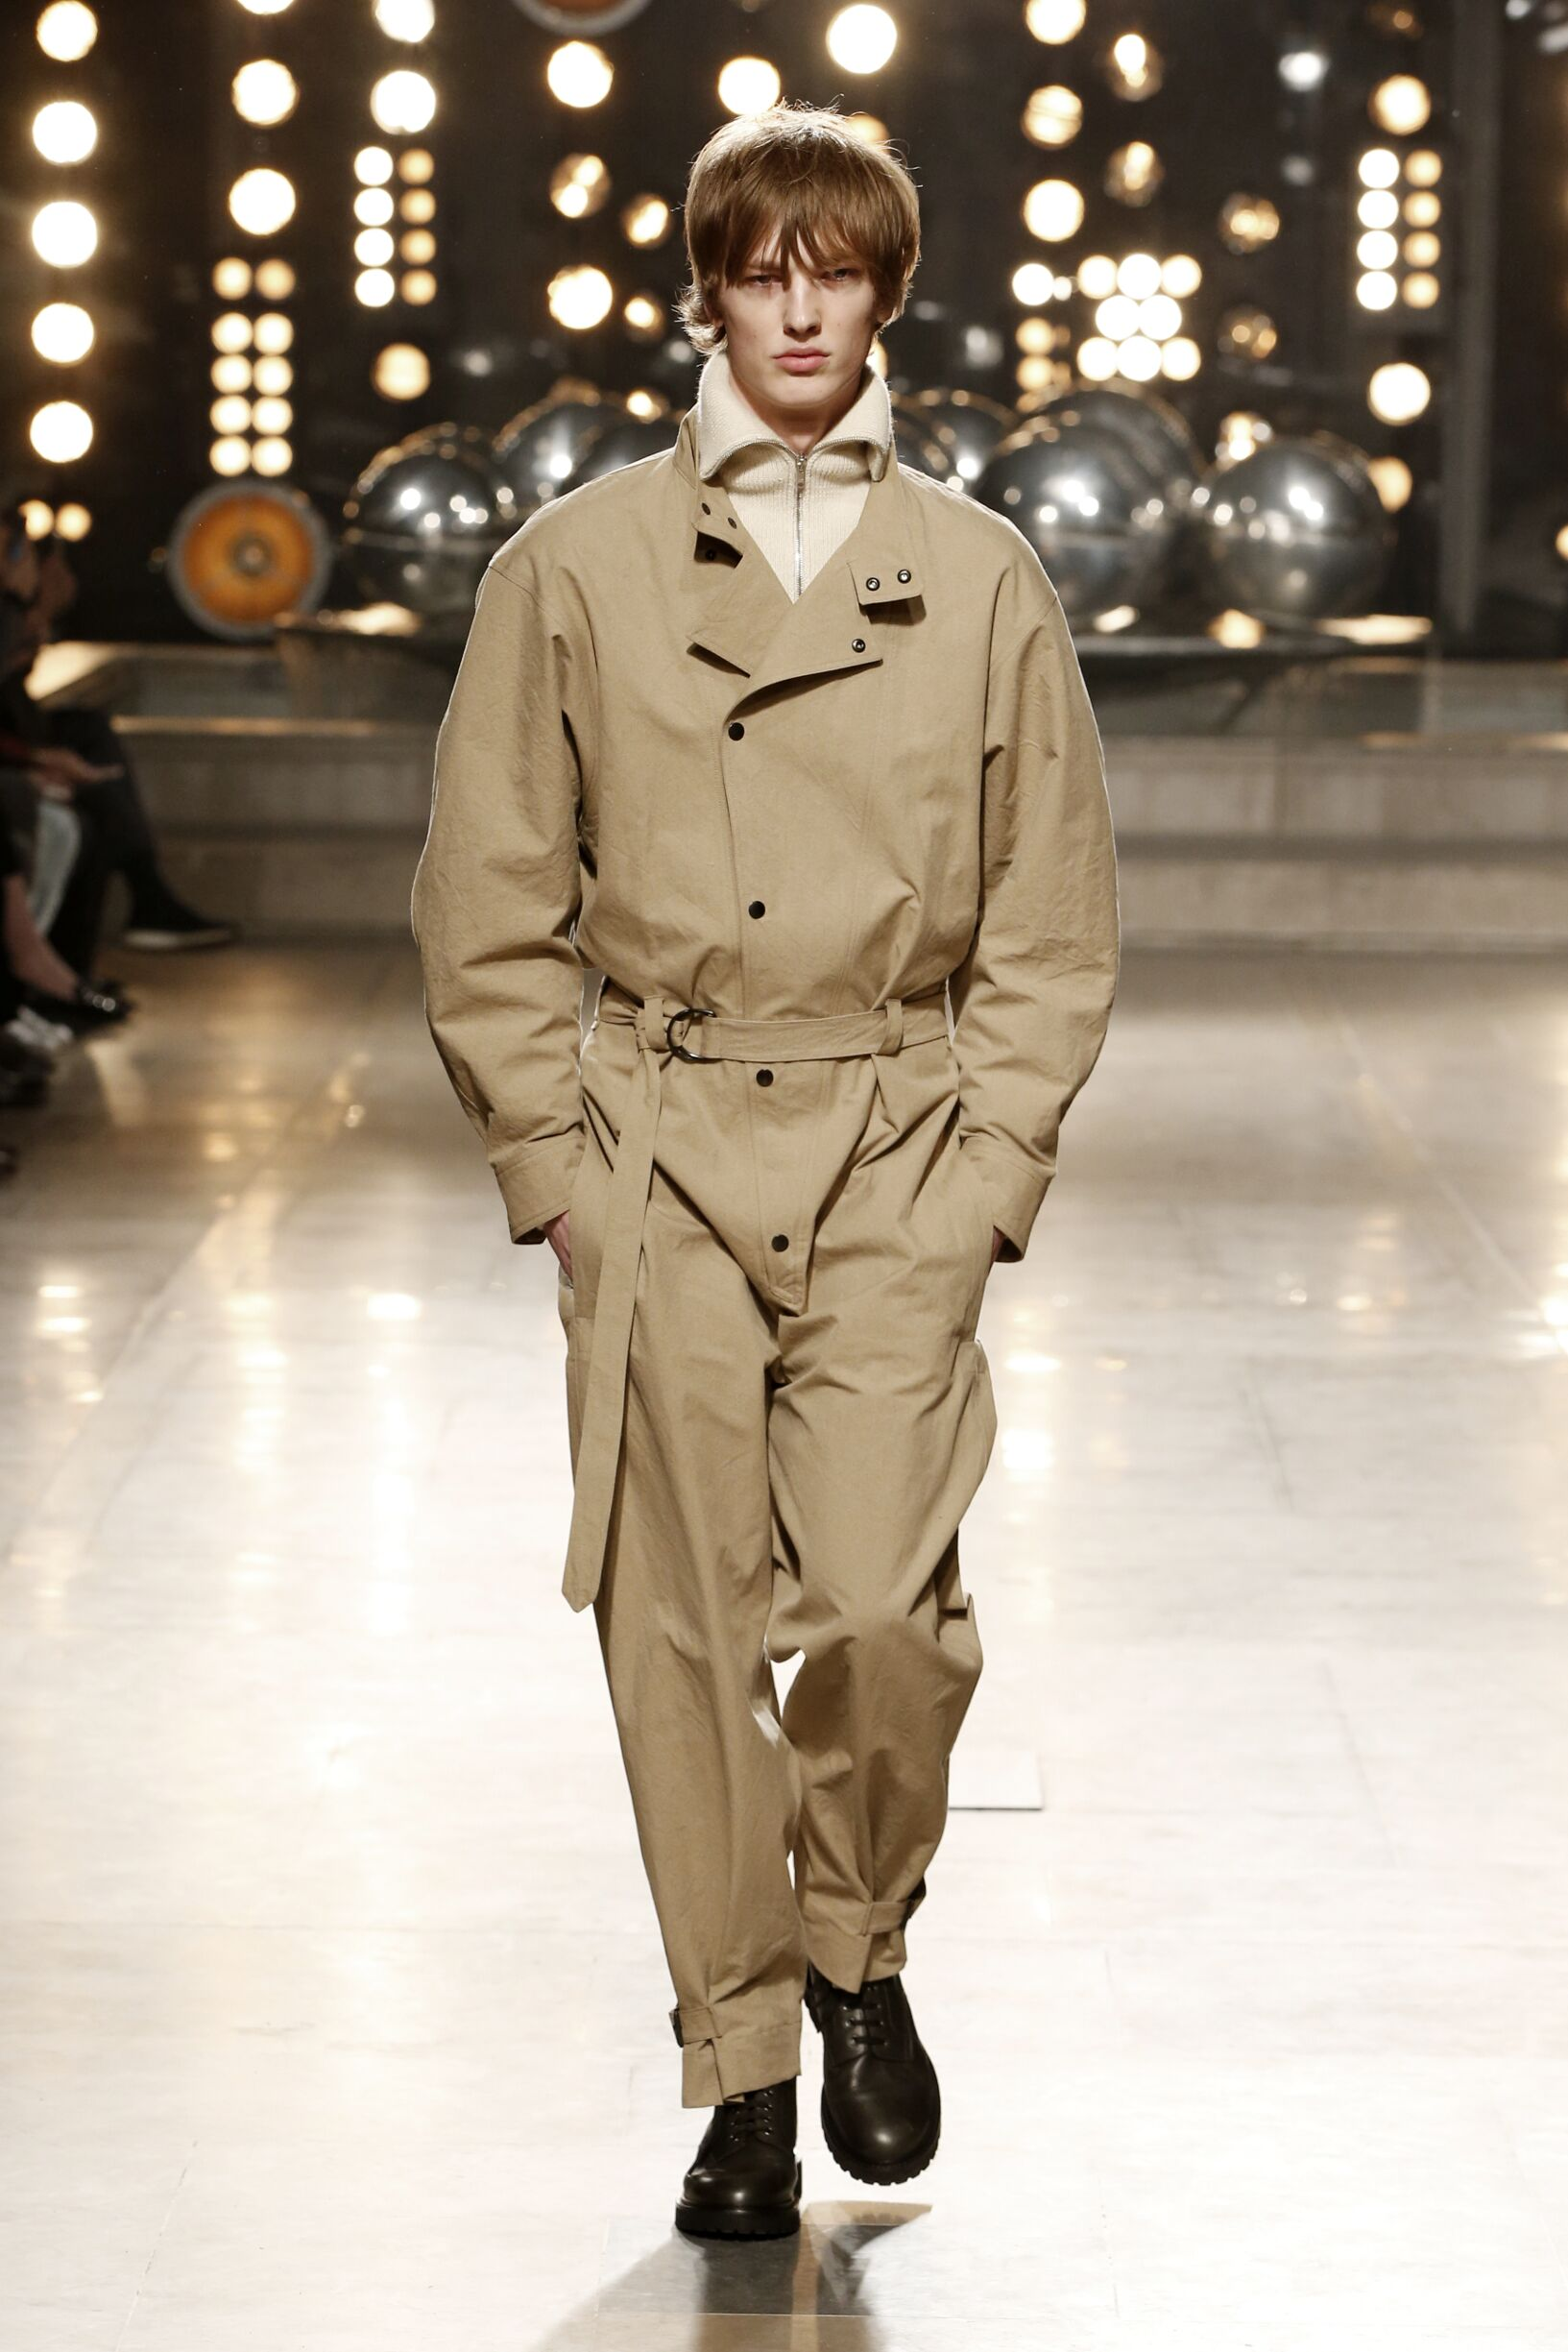 Isabel Marant FW 2019 Menswear